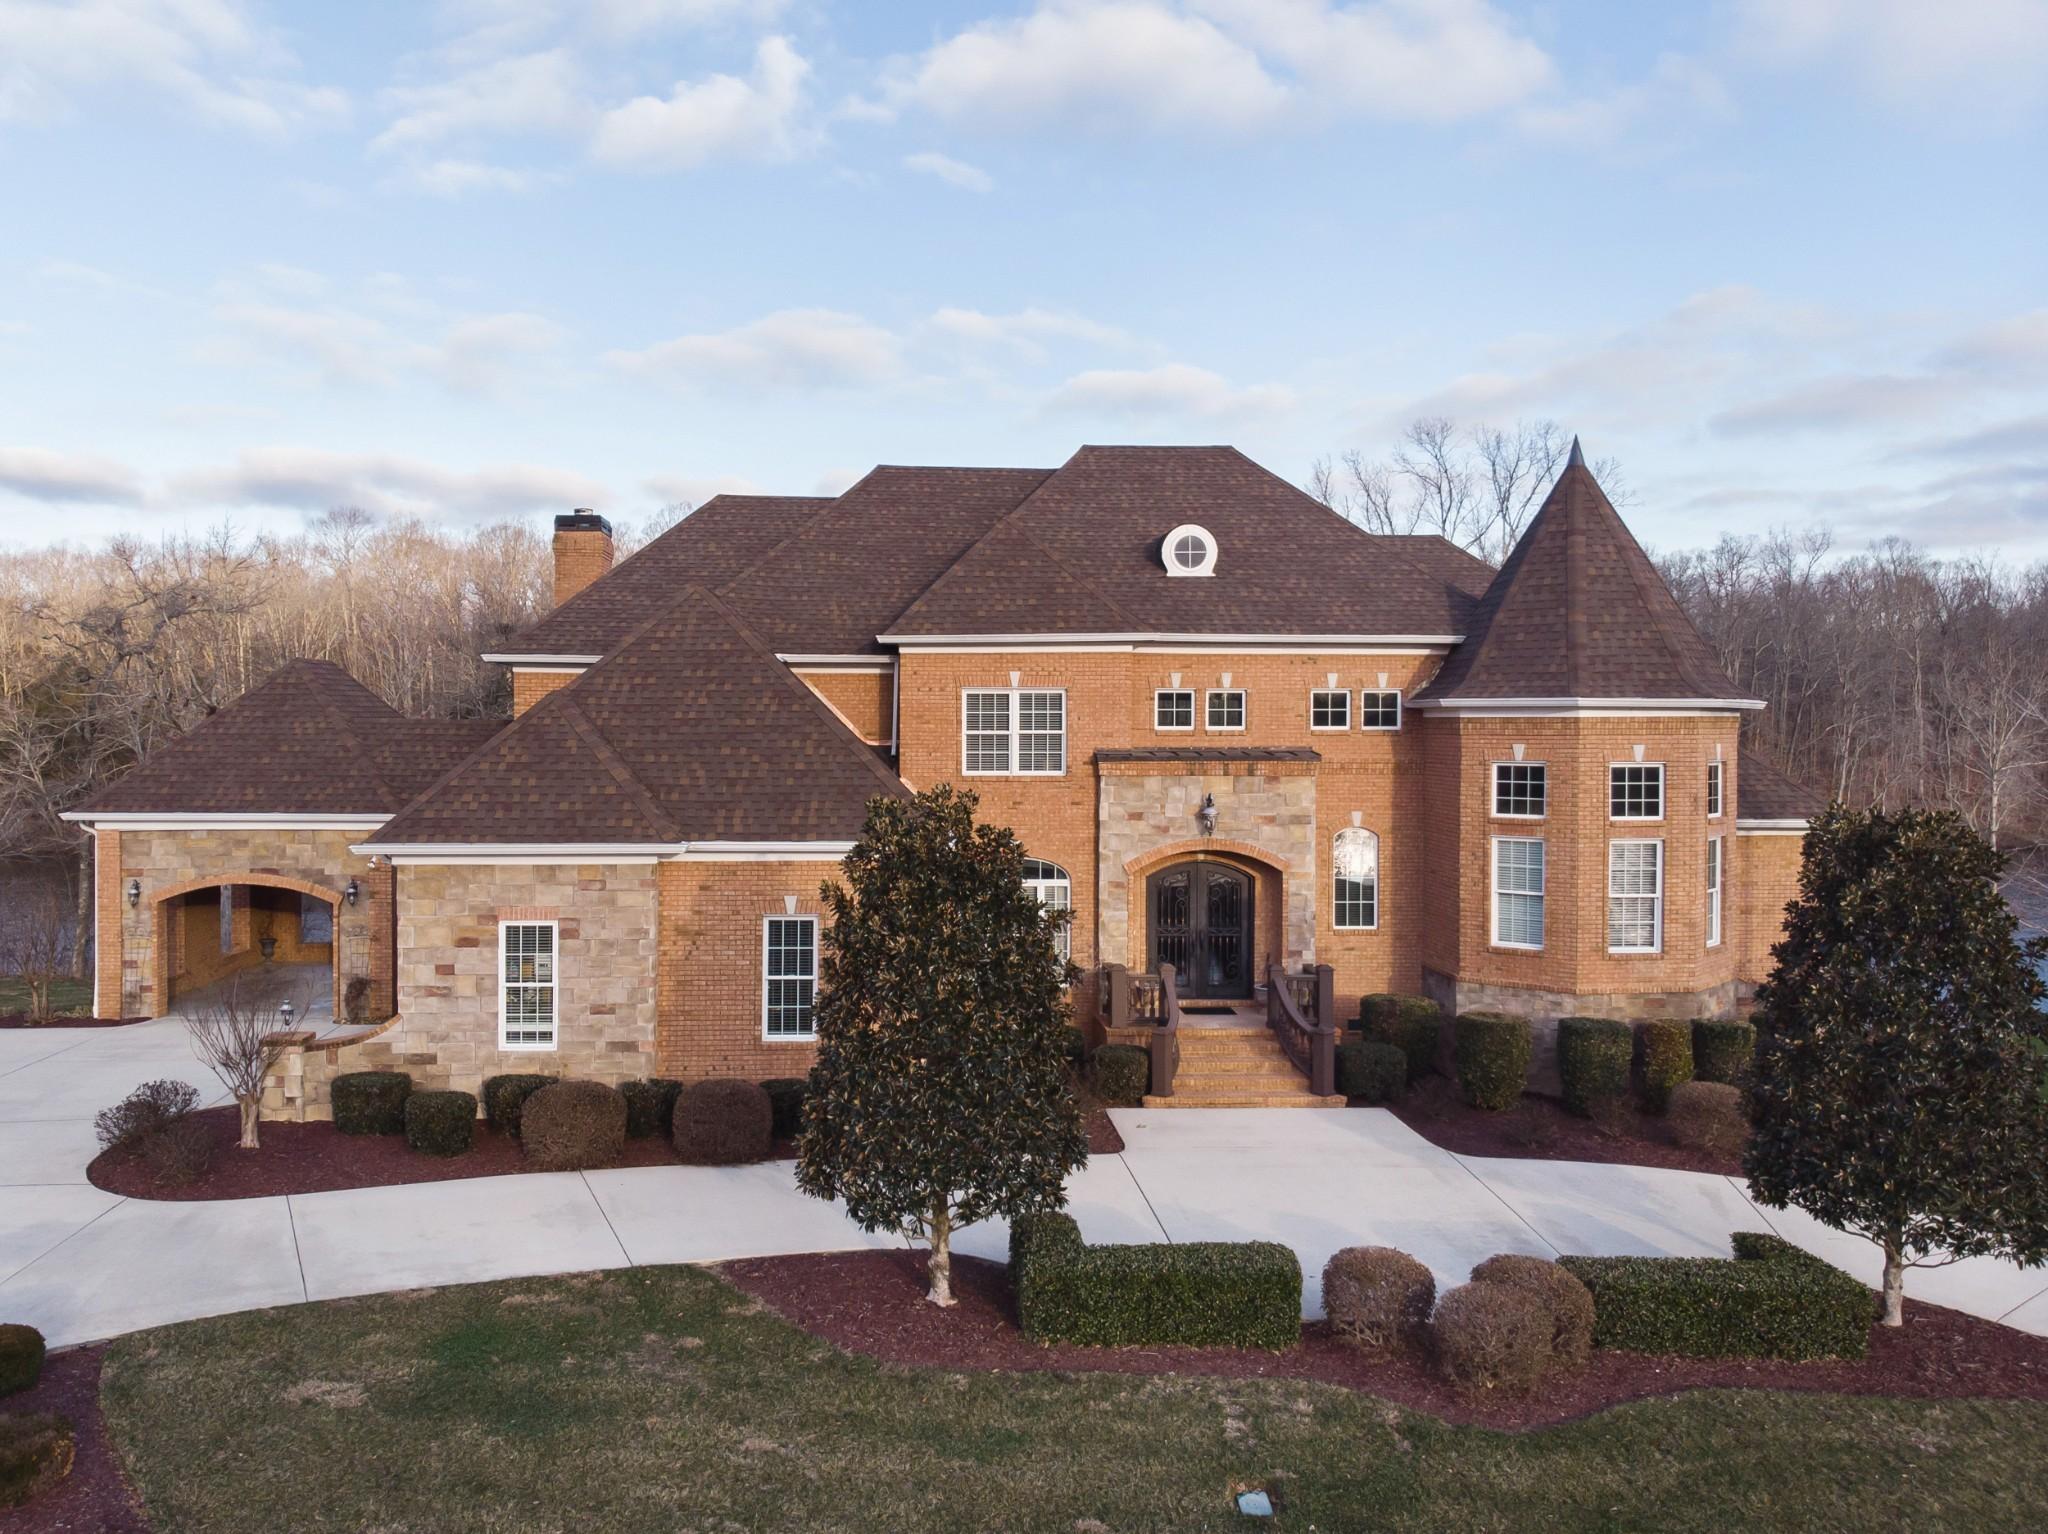 203 Setters LN, E, Tullahoma, TN 37388 - Tullahoma, TN real estate listing